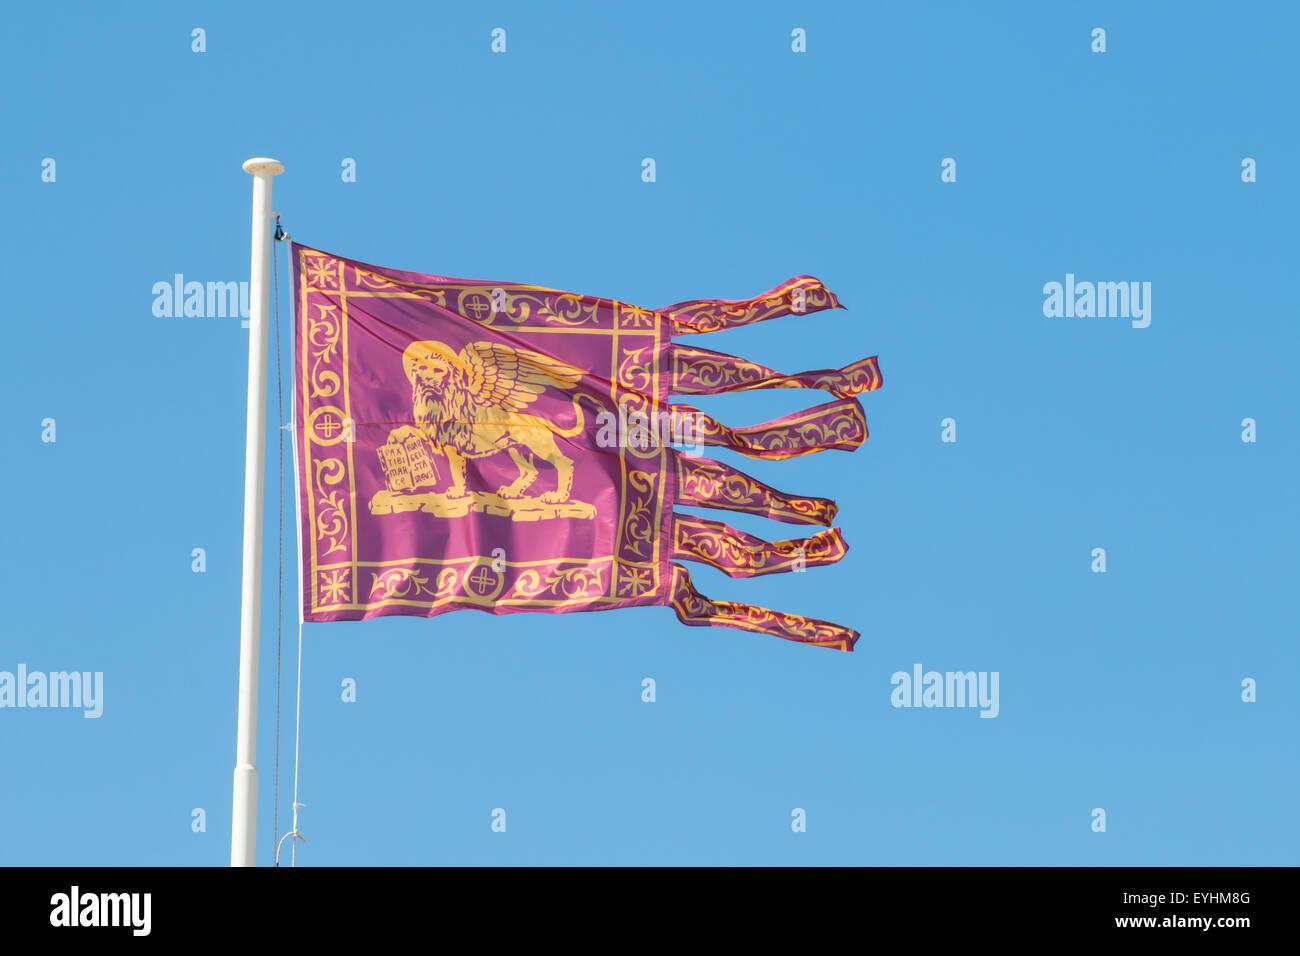 Winged Lion Flag Stock Photos & Winged Lion Flag Stock Images - Alamy